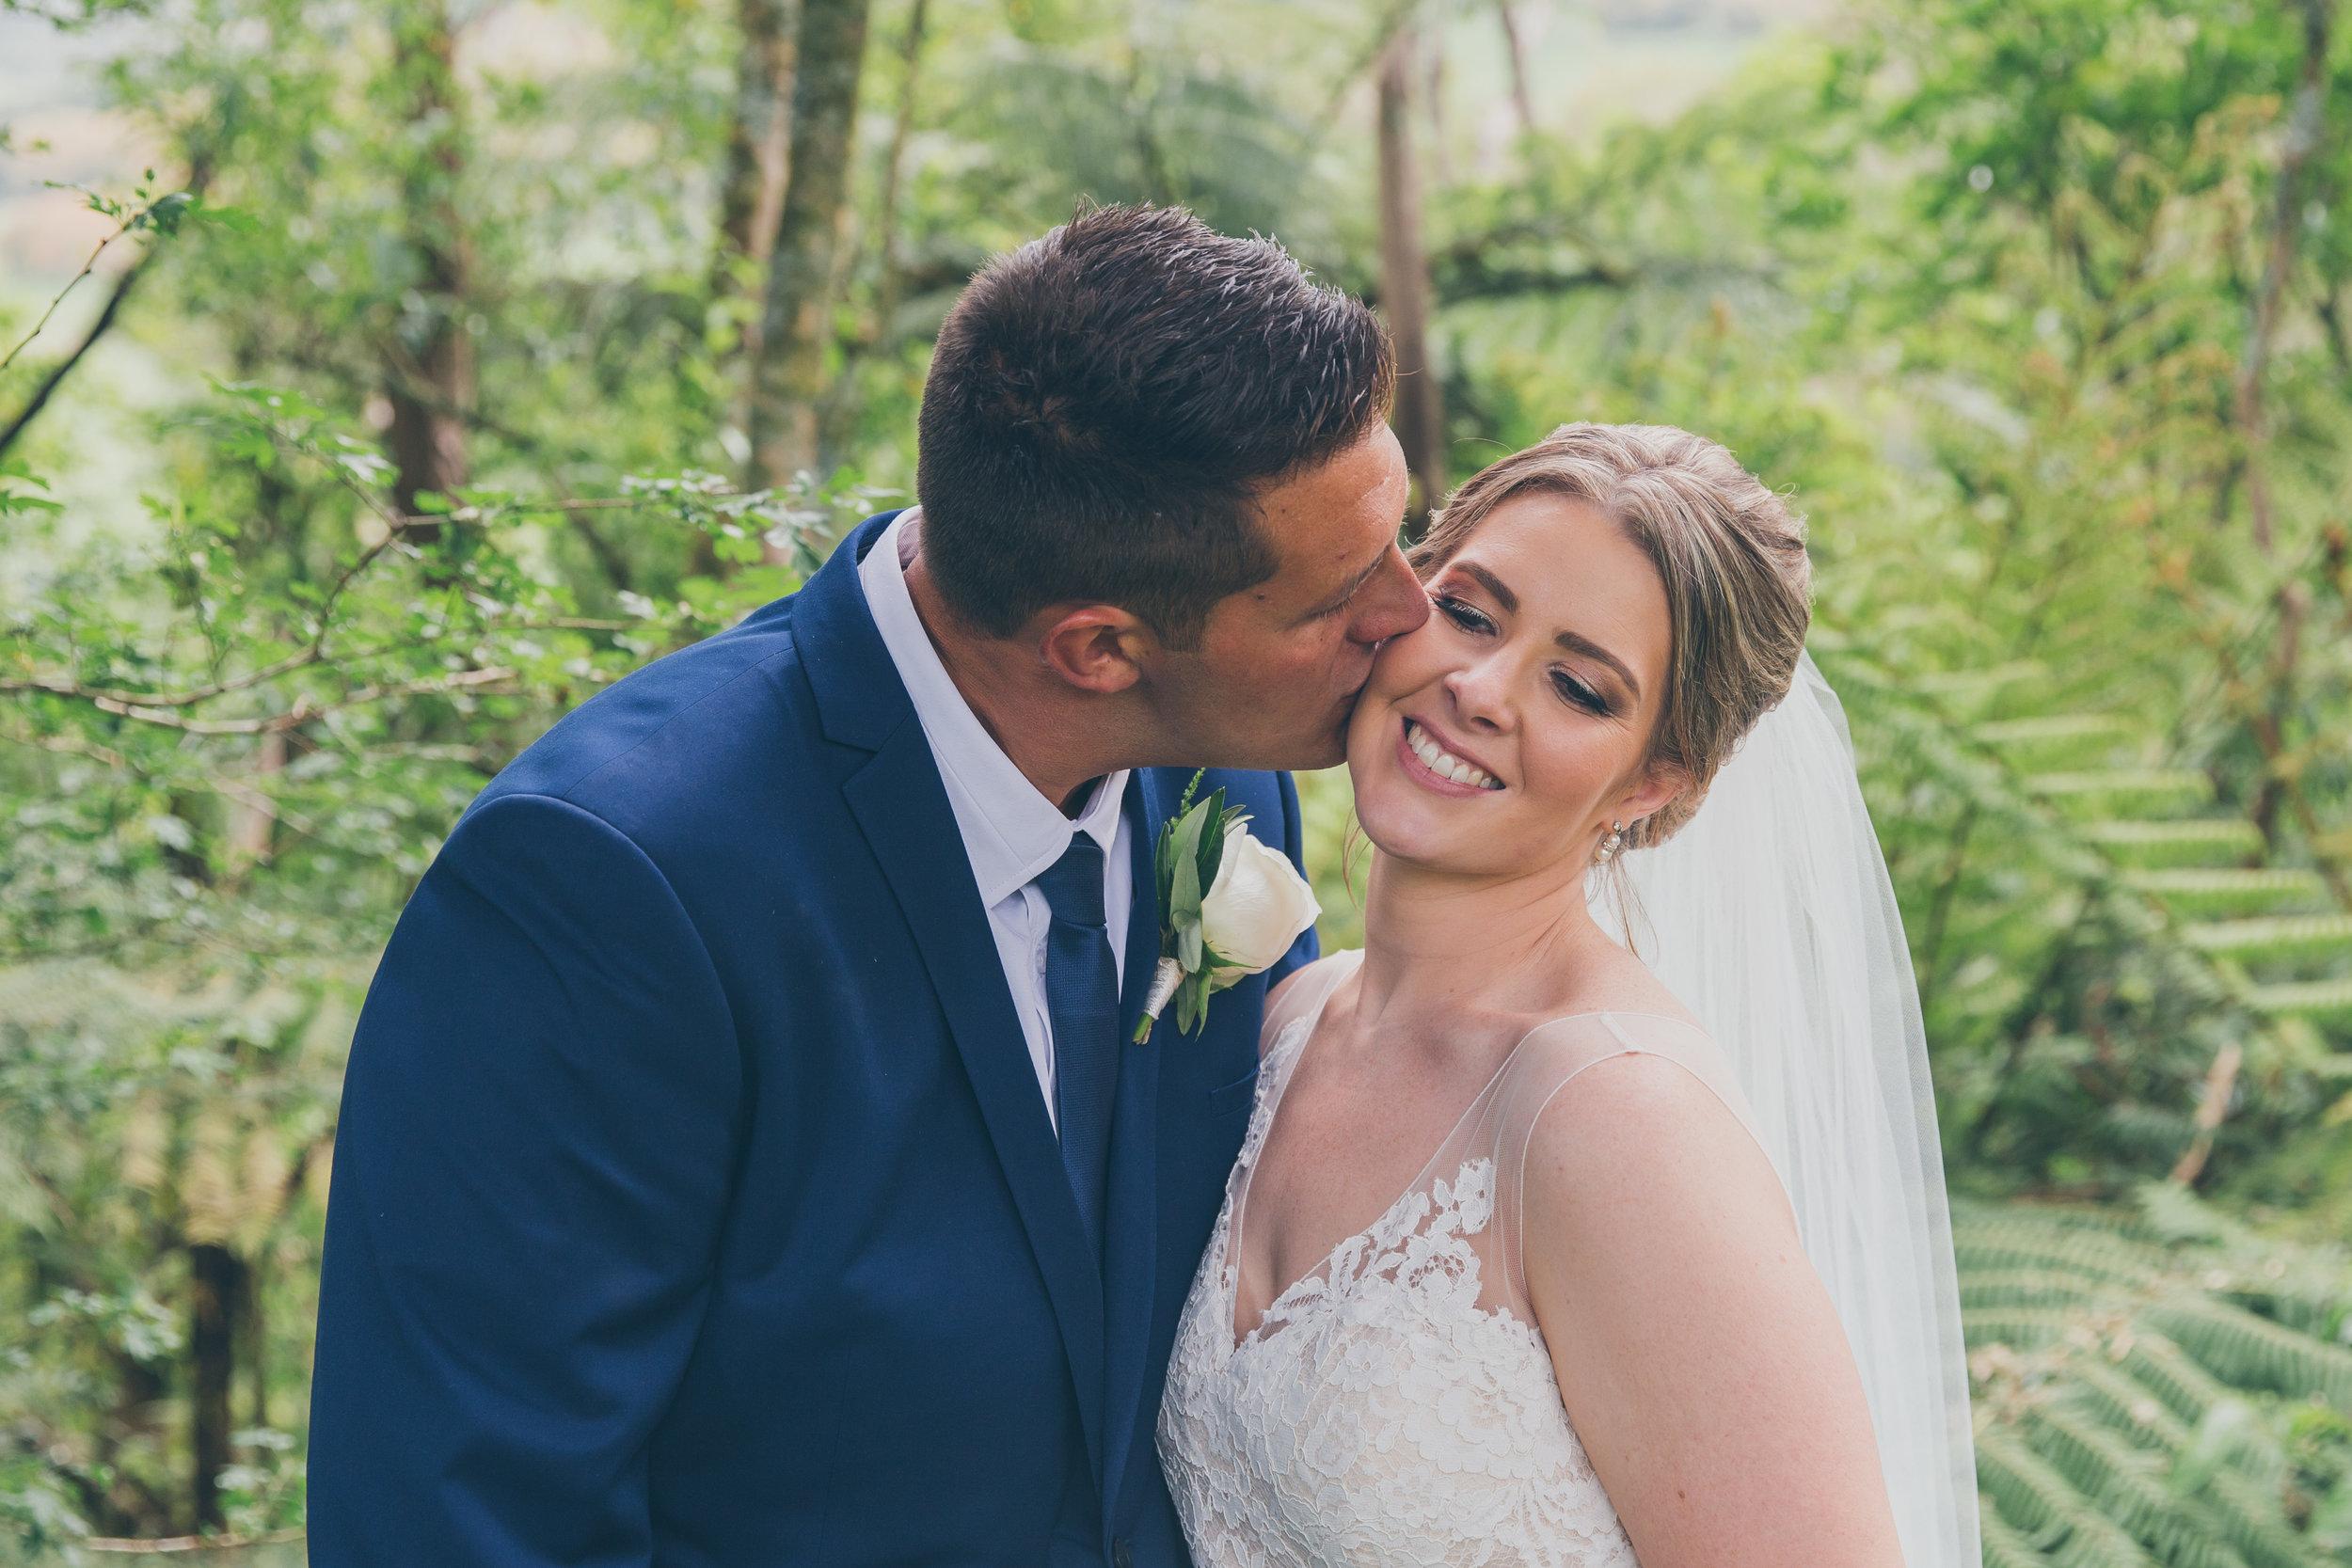 C & J - Wedding - Oh Joy! Photography - Tauranga, New Zealand-9.jpg